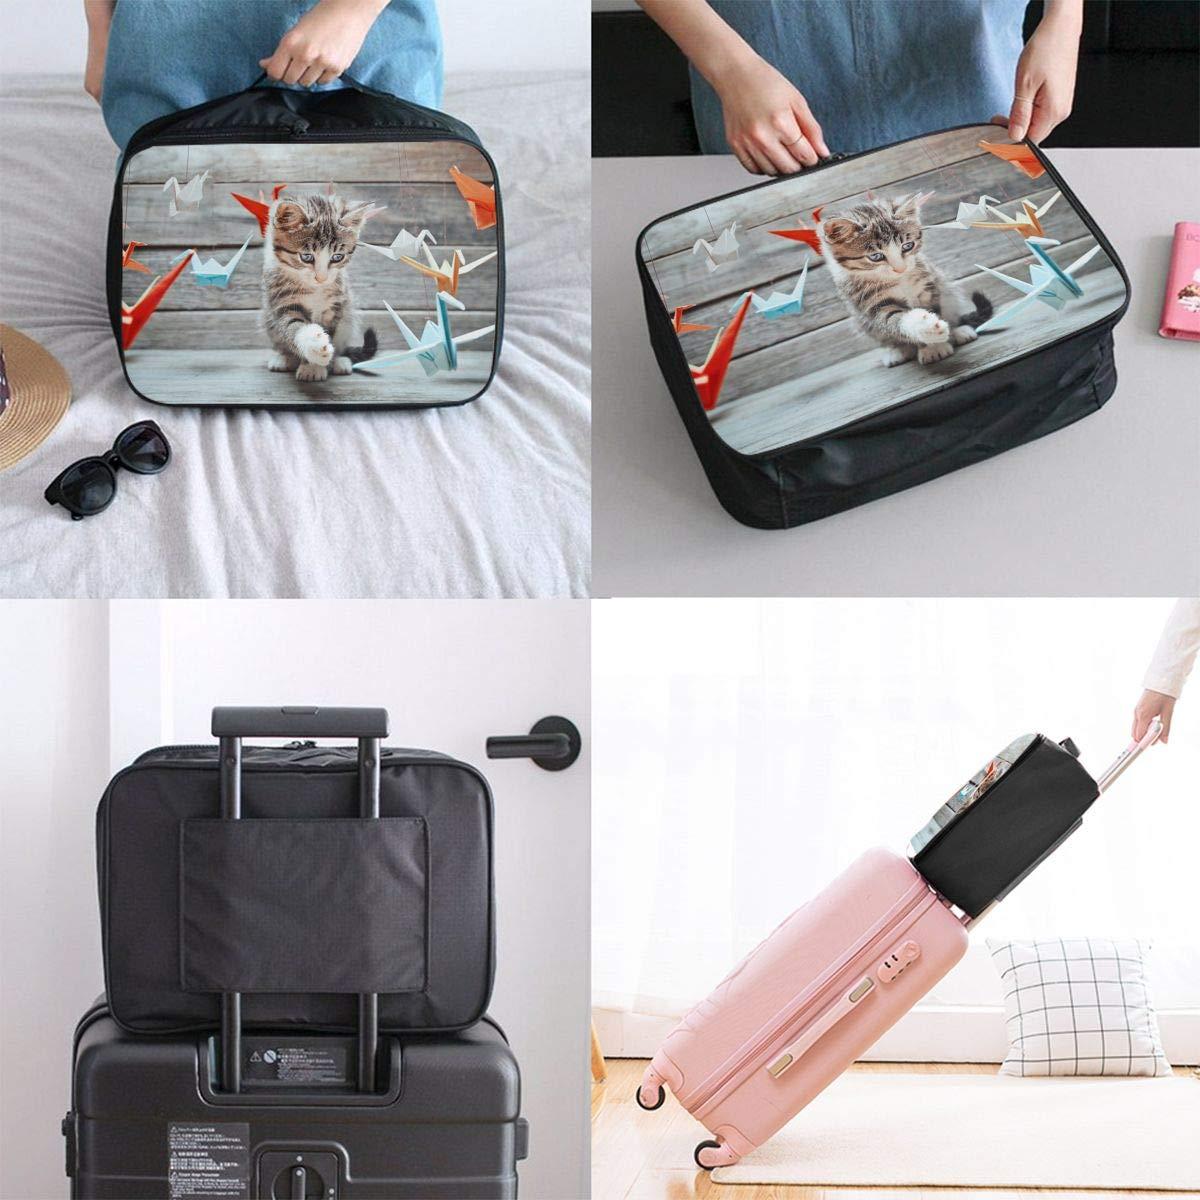 Travel Luggage Duffle Bag Lightweight Portable Handbag Cat Origami Cranes Pattern Large Capacity Waterproof Foldable Storage Tote